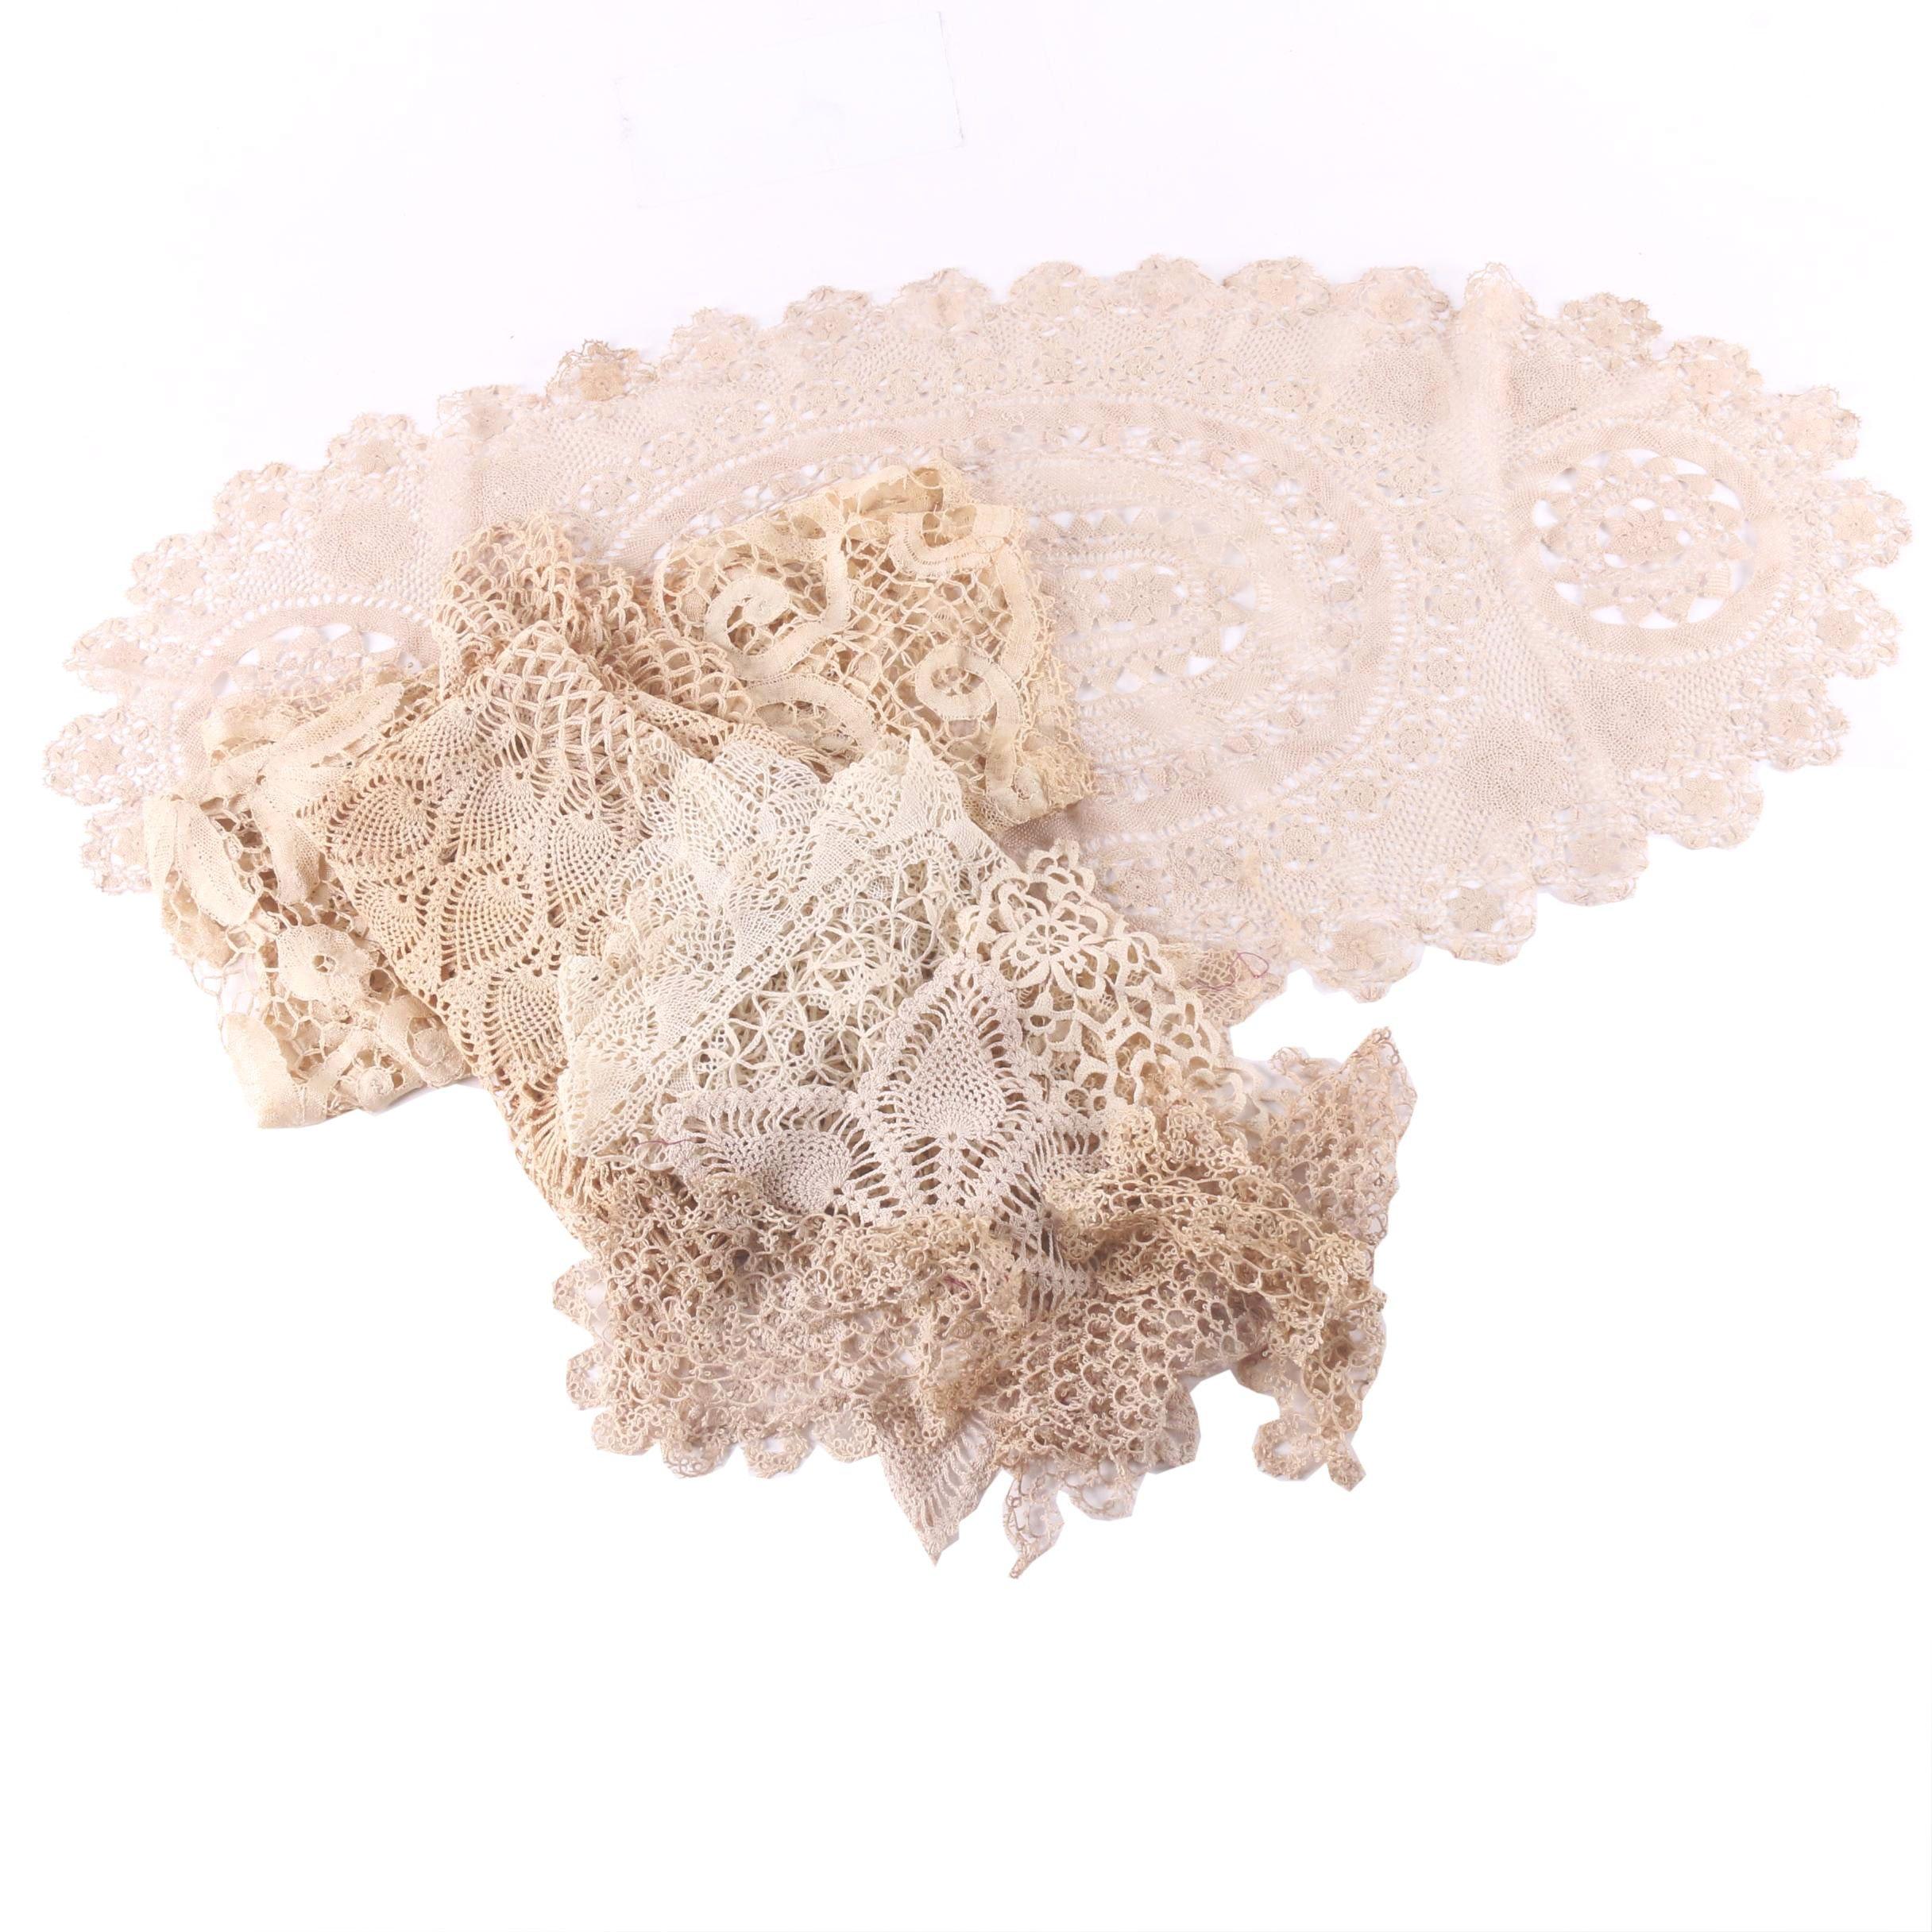 Vintage Handmade Lace Doilies